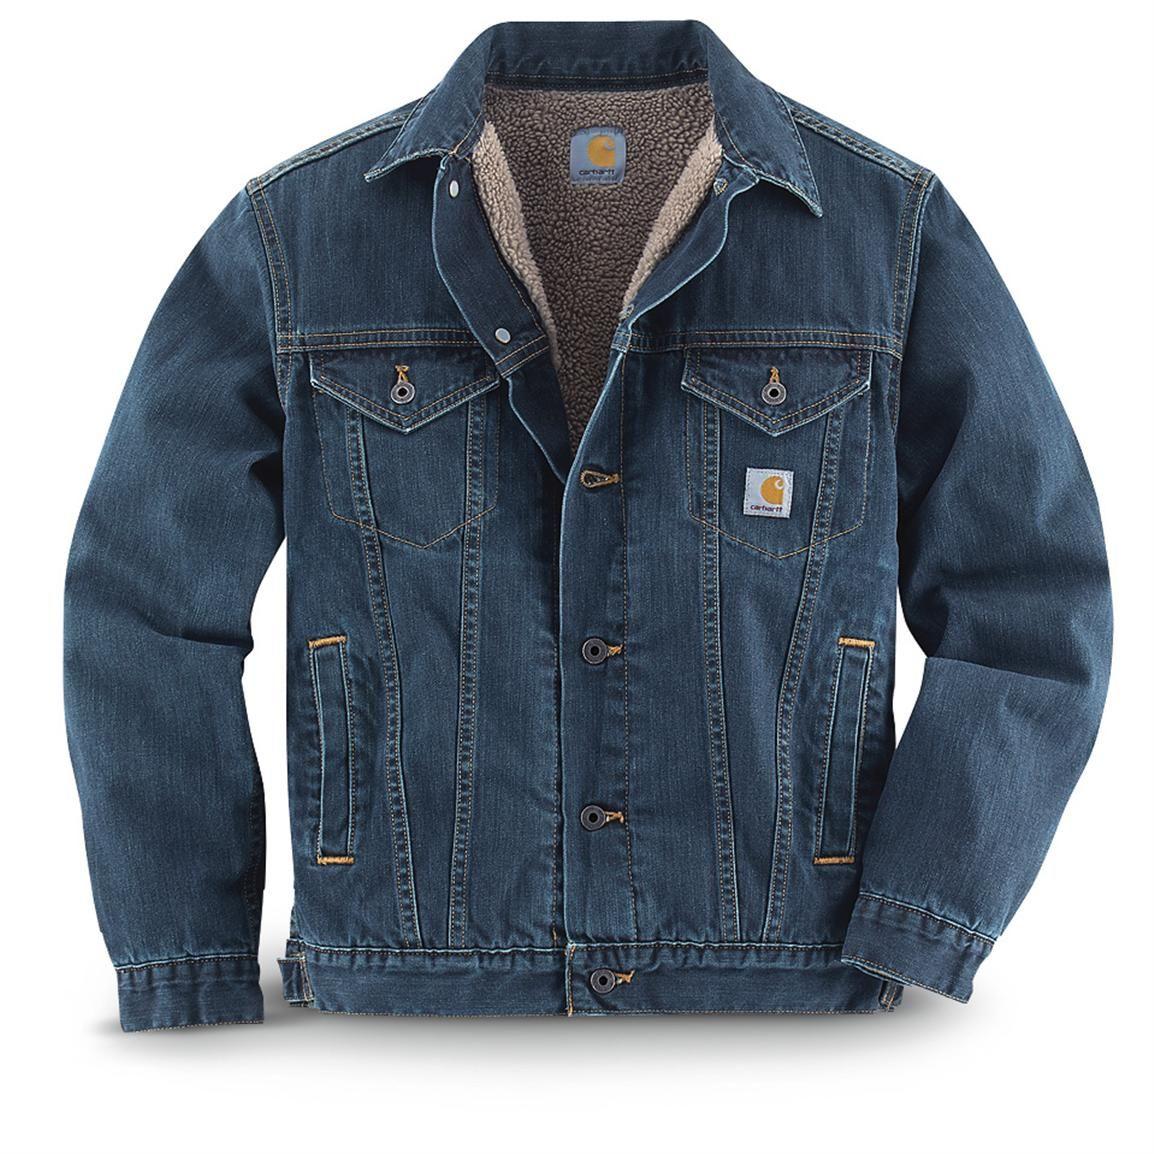 Carhartt Sherpa Lined Work Clothes Jean Jacket Authentic Blue Lined Denim Jacket Denim Jacket Men Carhartt Jacket [ 1154 x 1154 Pixel ]